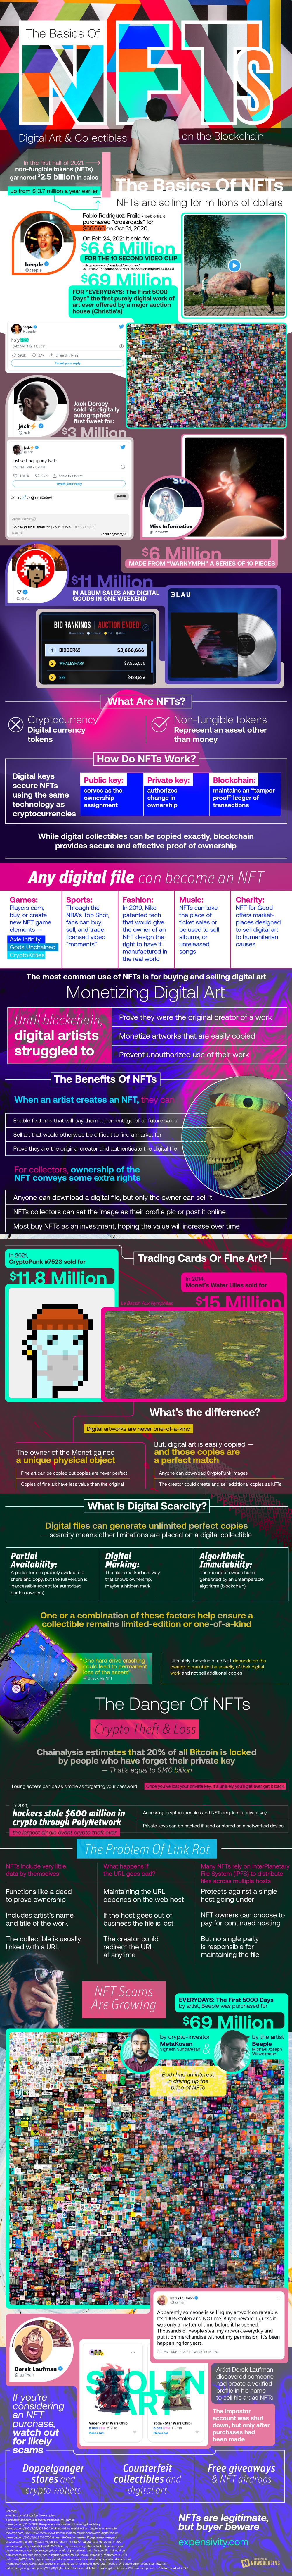 Learn the Basics of NFTs